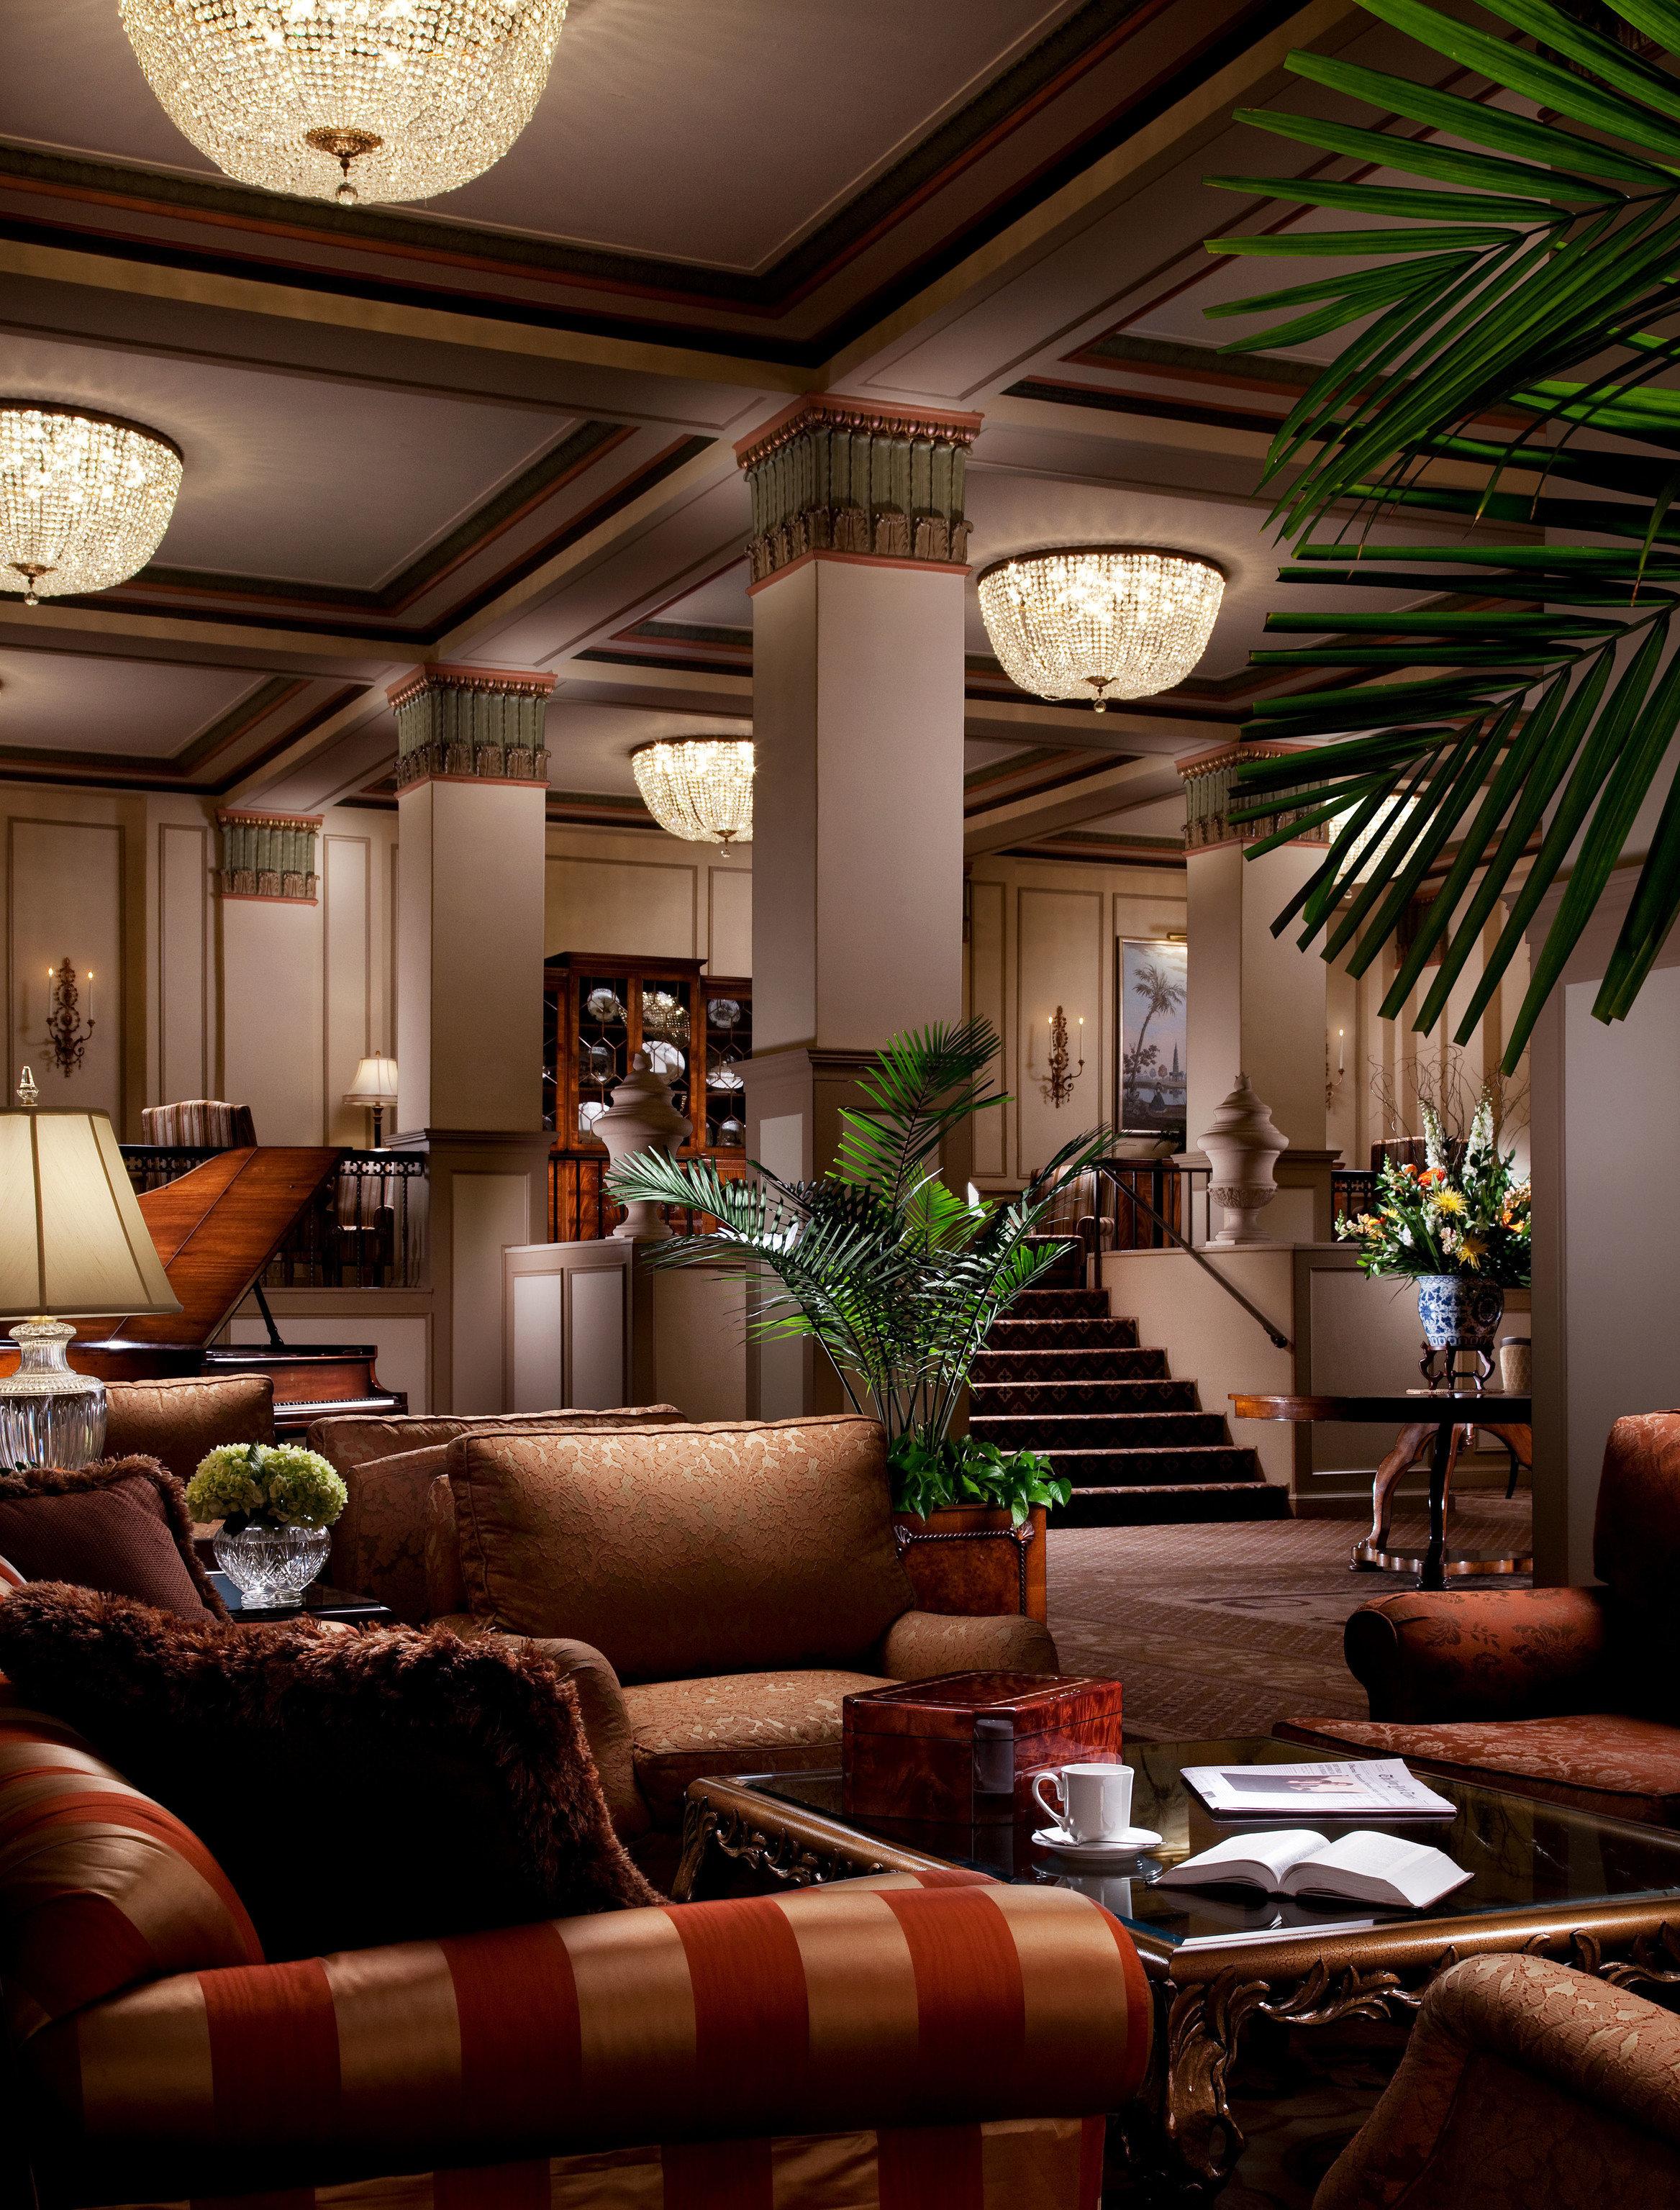 sofa Lobby living room property home mansion condominium screenshot leather